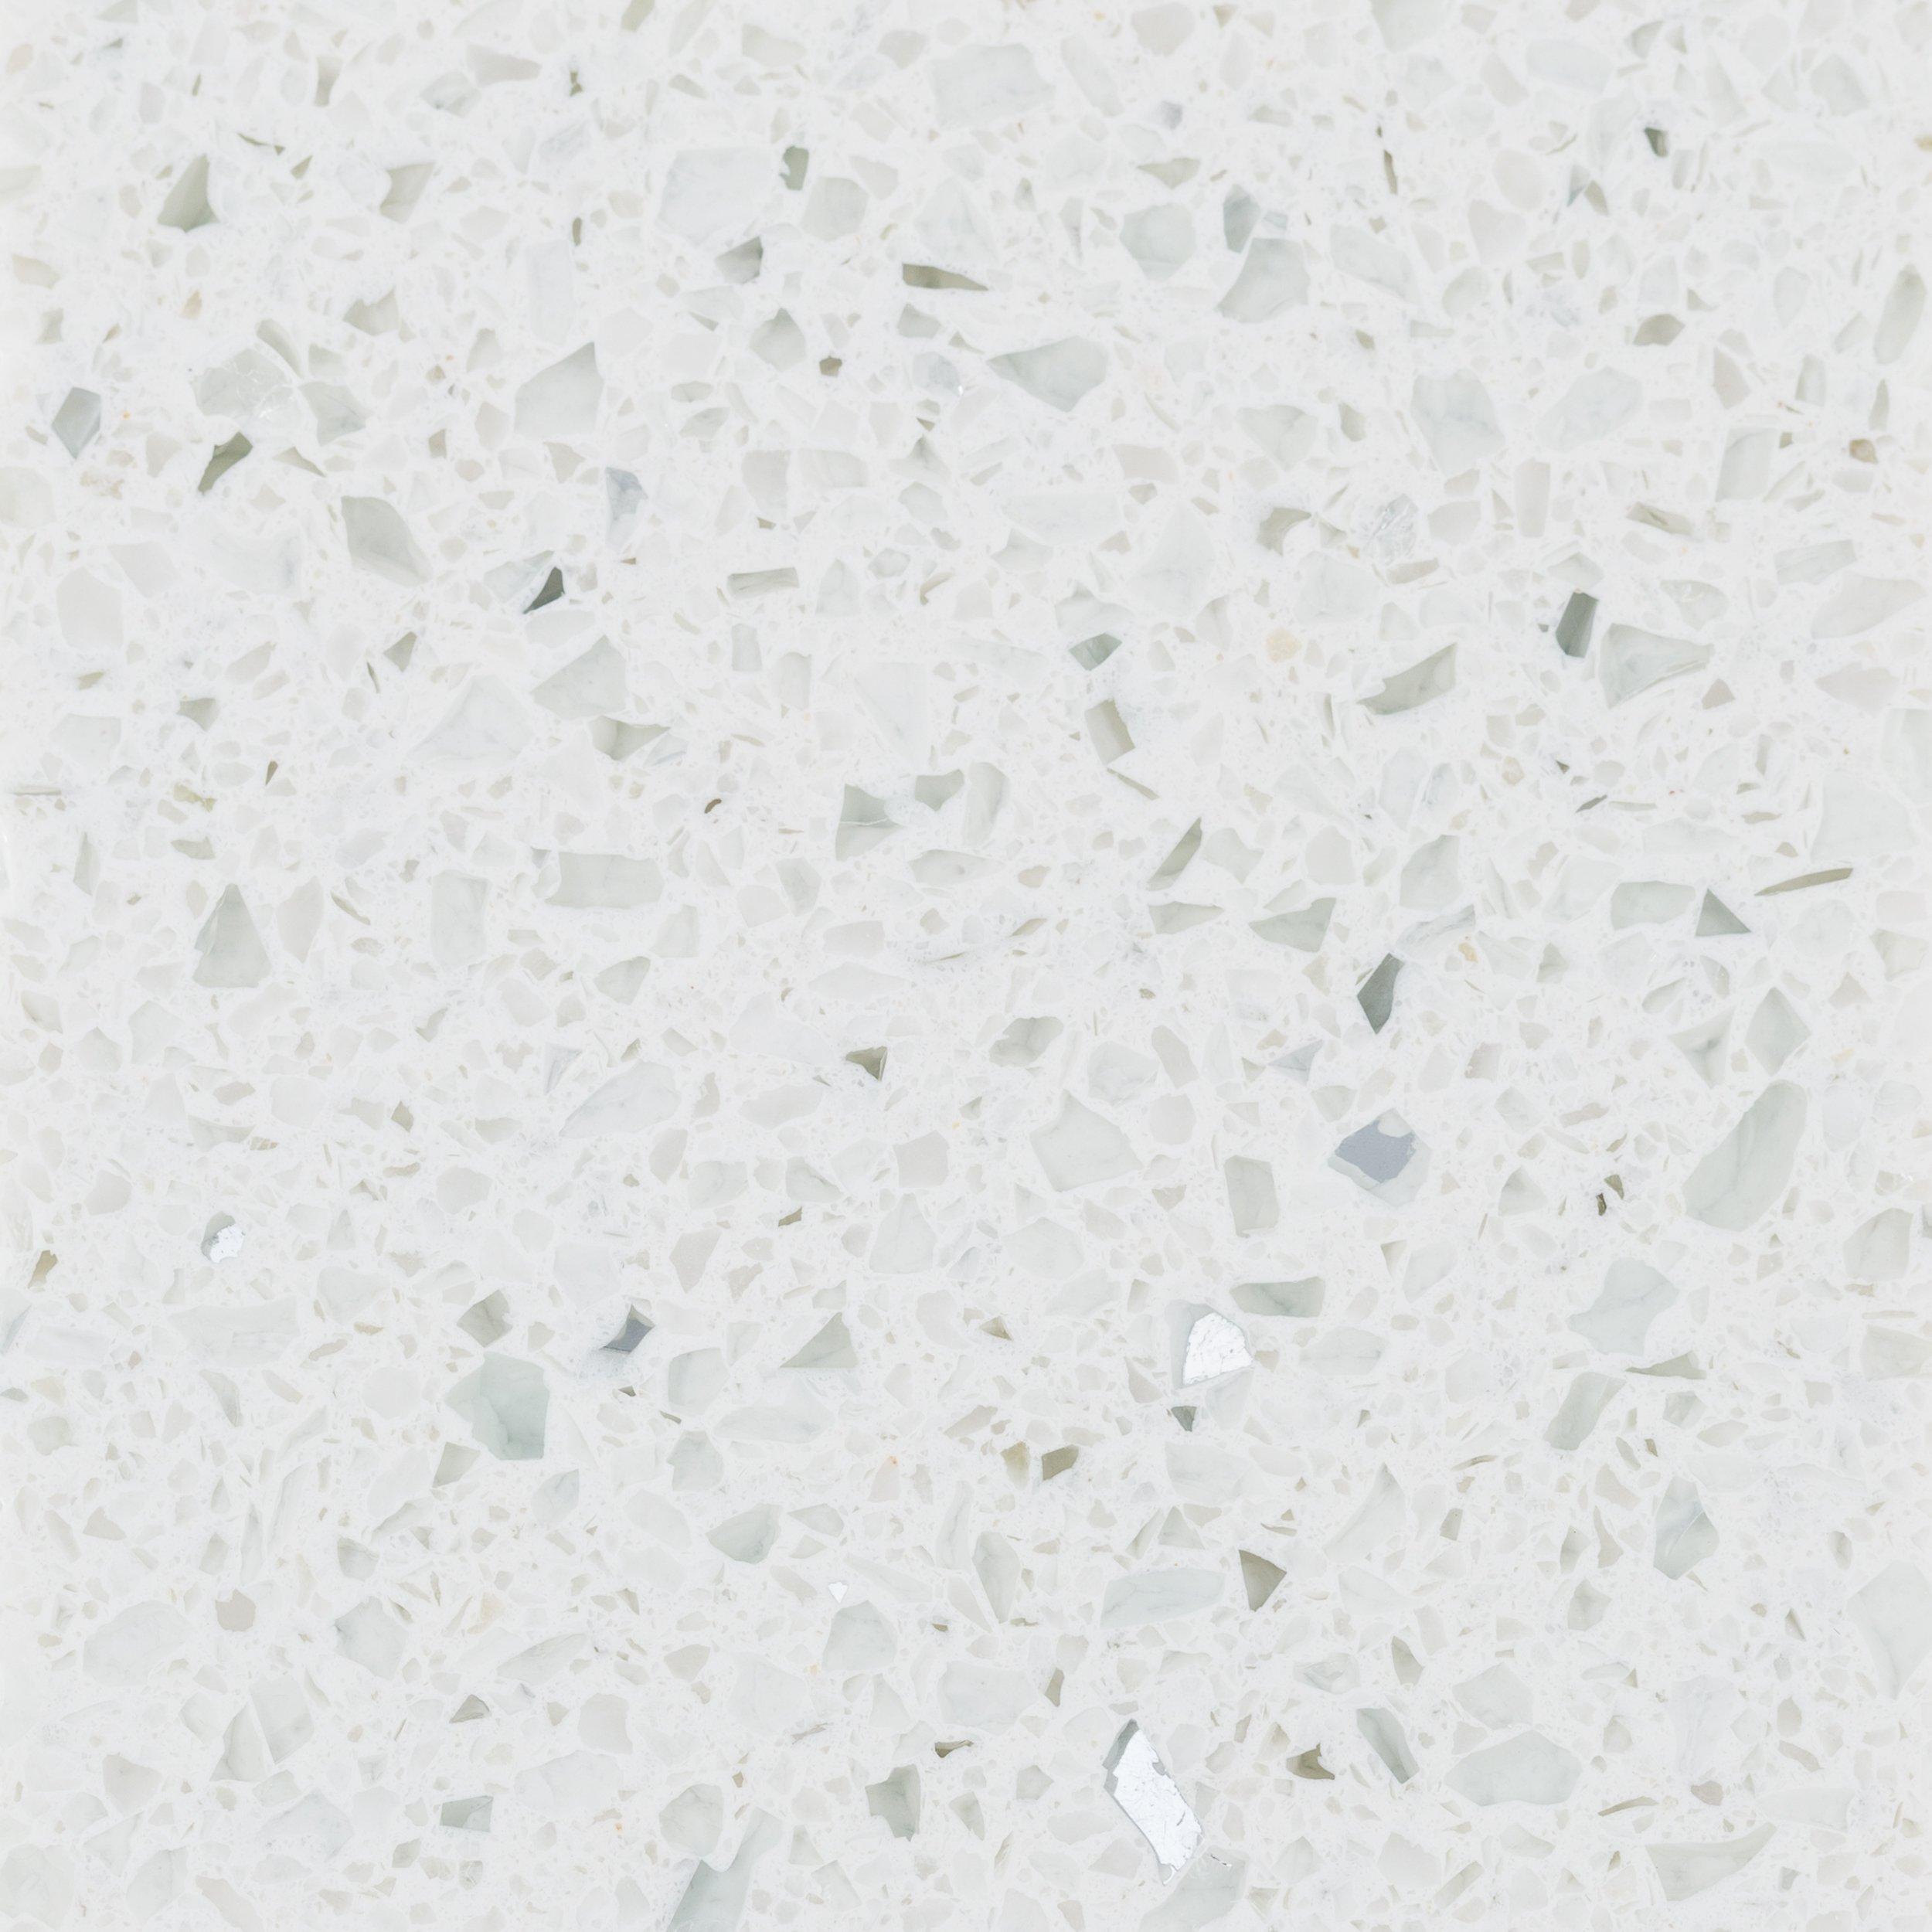 Sparkling White Quartz Countertops Best Home Renovation 2019 By